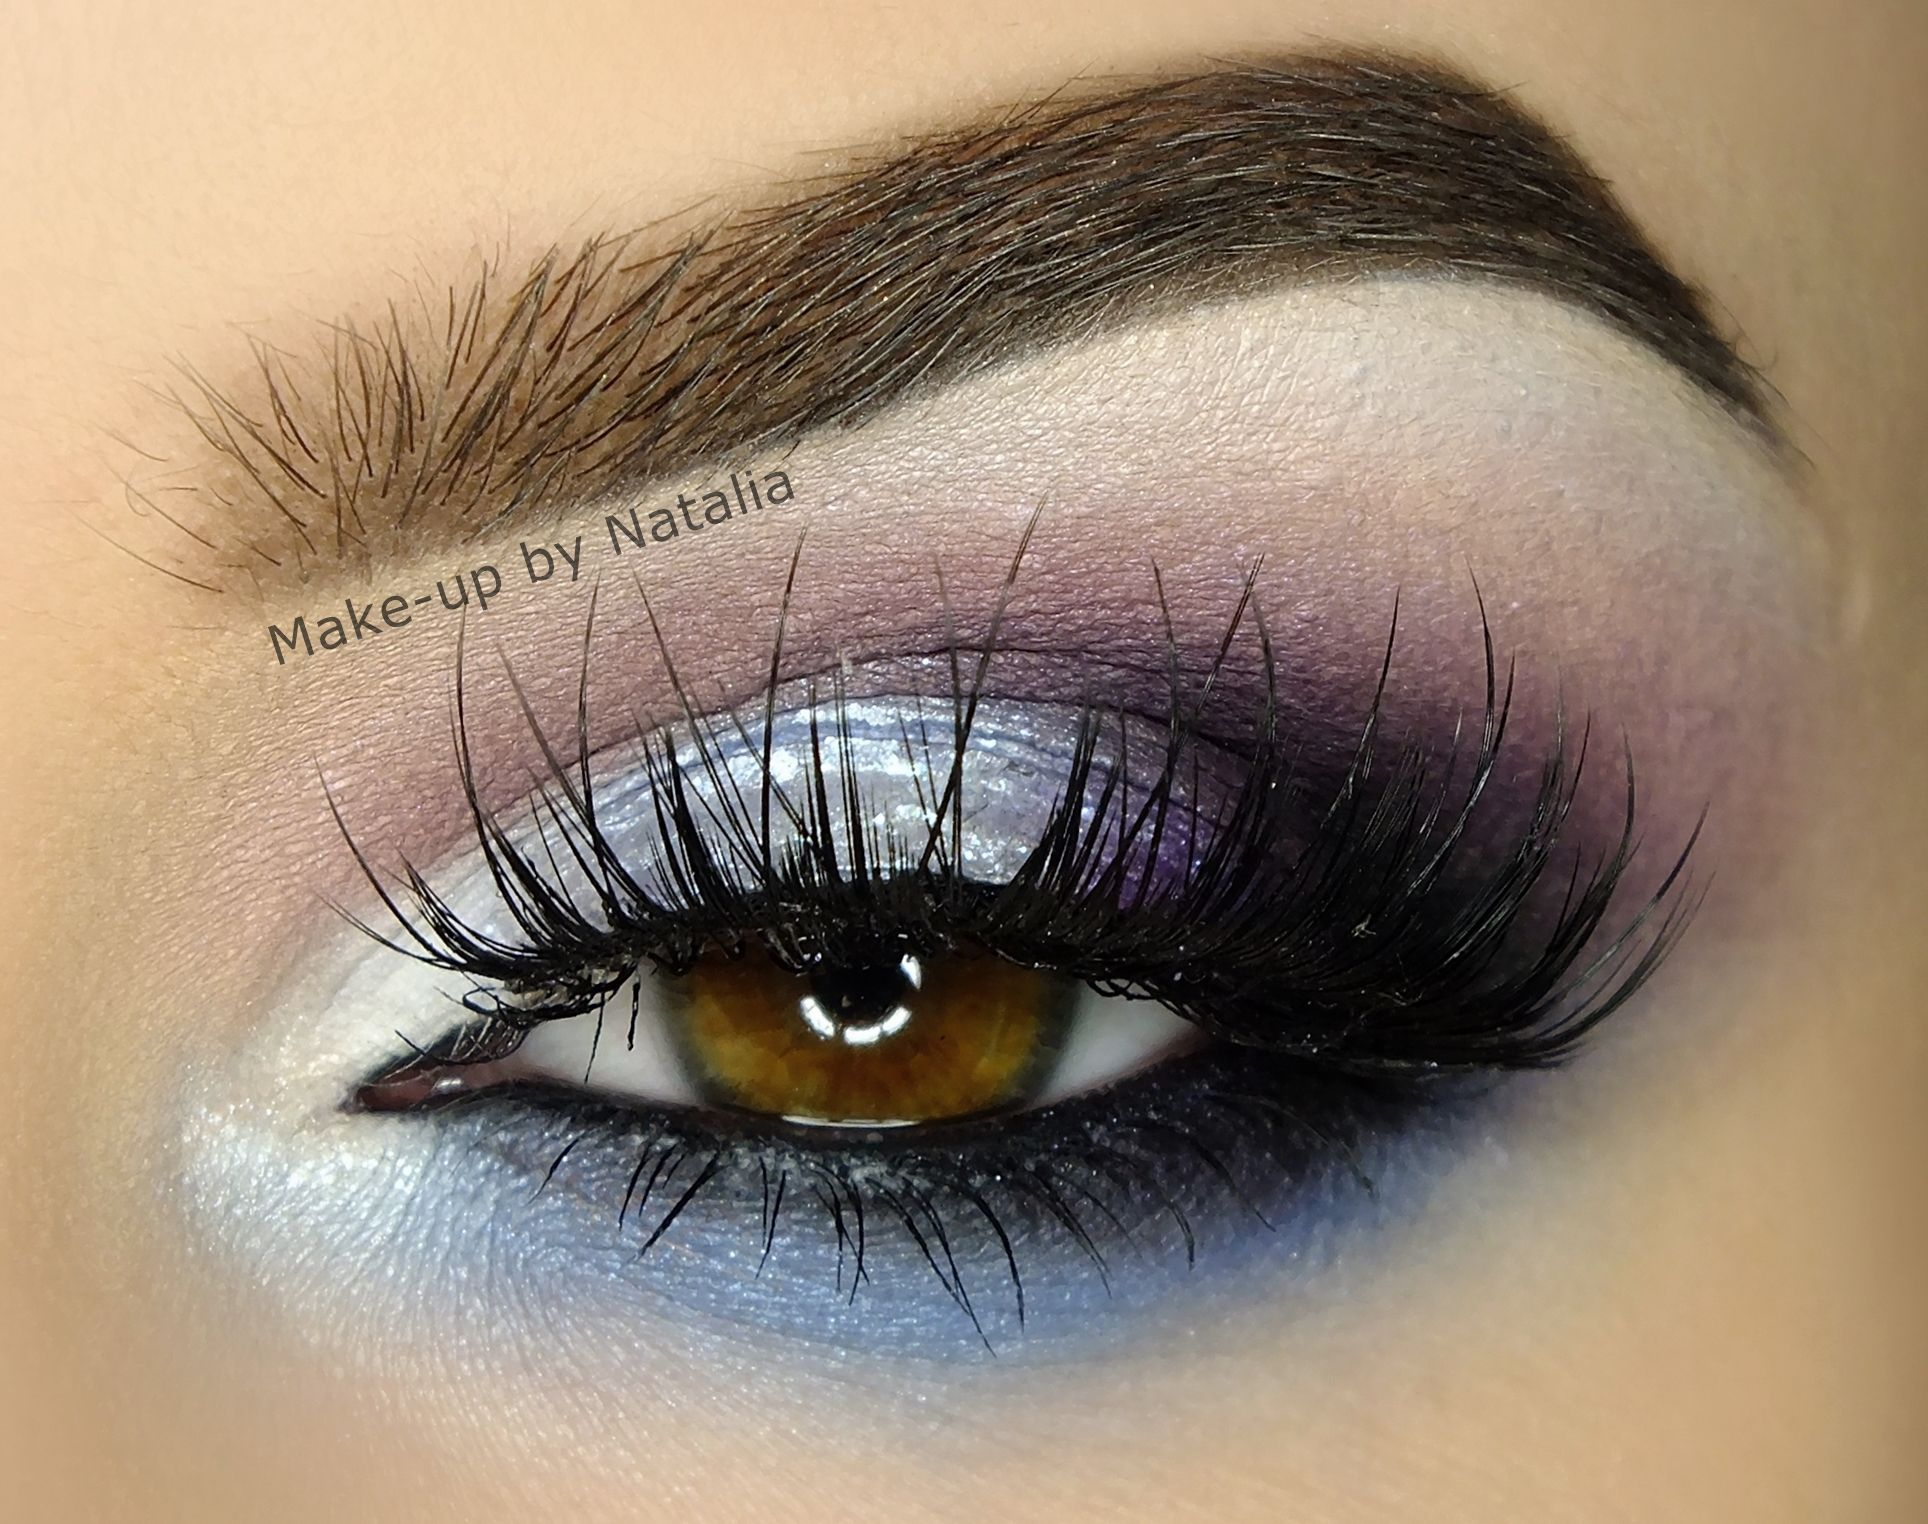 Makeup Geek Eyeshadows in Corrupt, Neptune and Wisteria. Look by: Natalia Piotrowicz